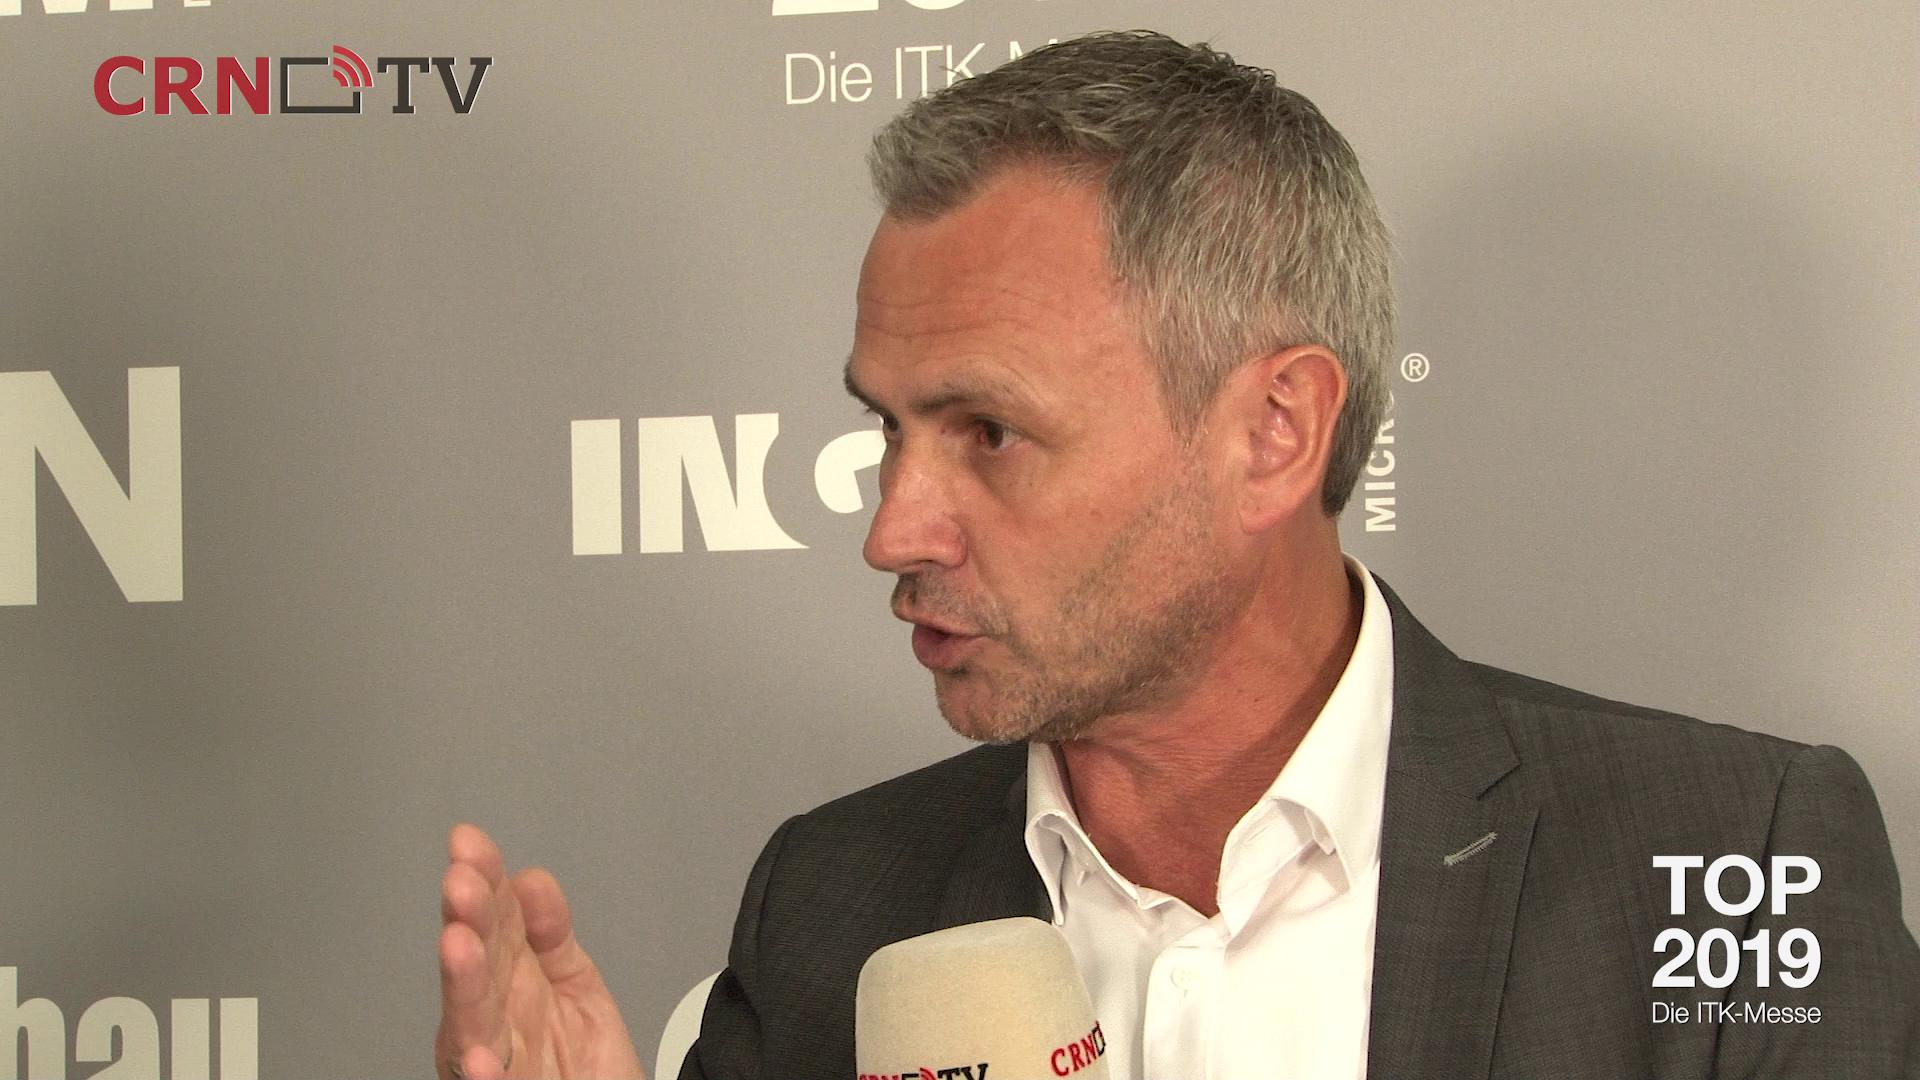 TOP 2019: Thomas Groß im Interview